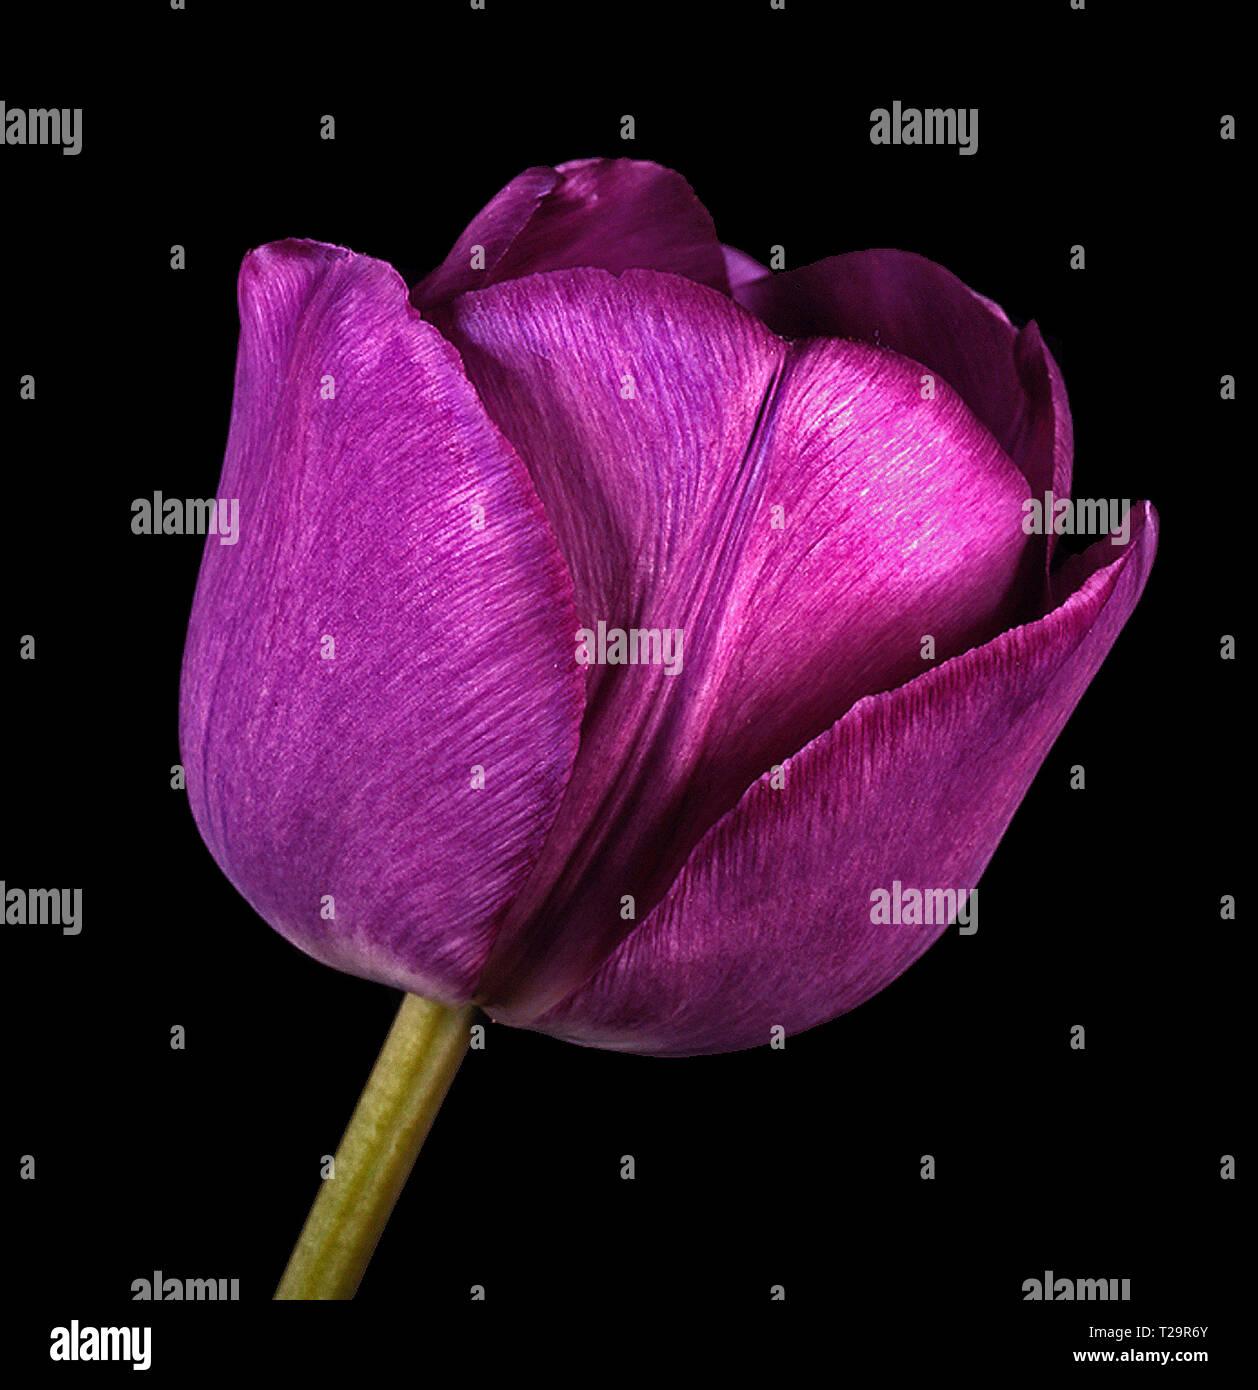 Close up studio portrait of an English Florists' Tulip 'Talisman' Stock Photo